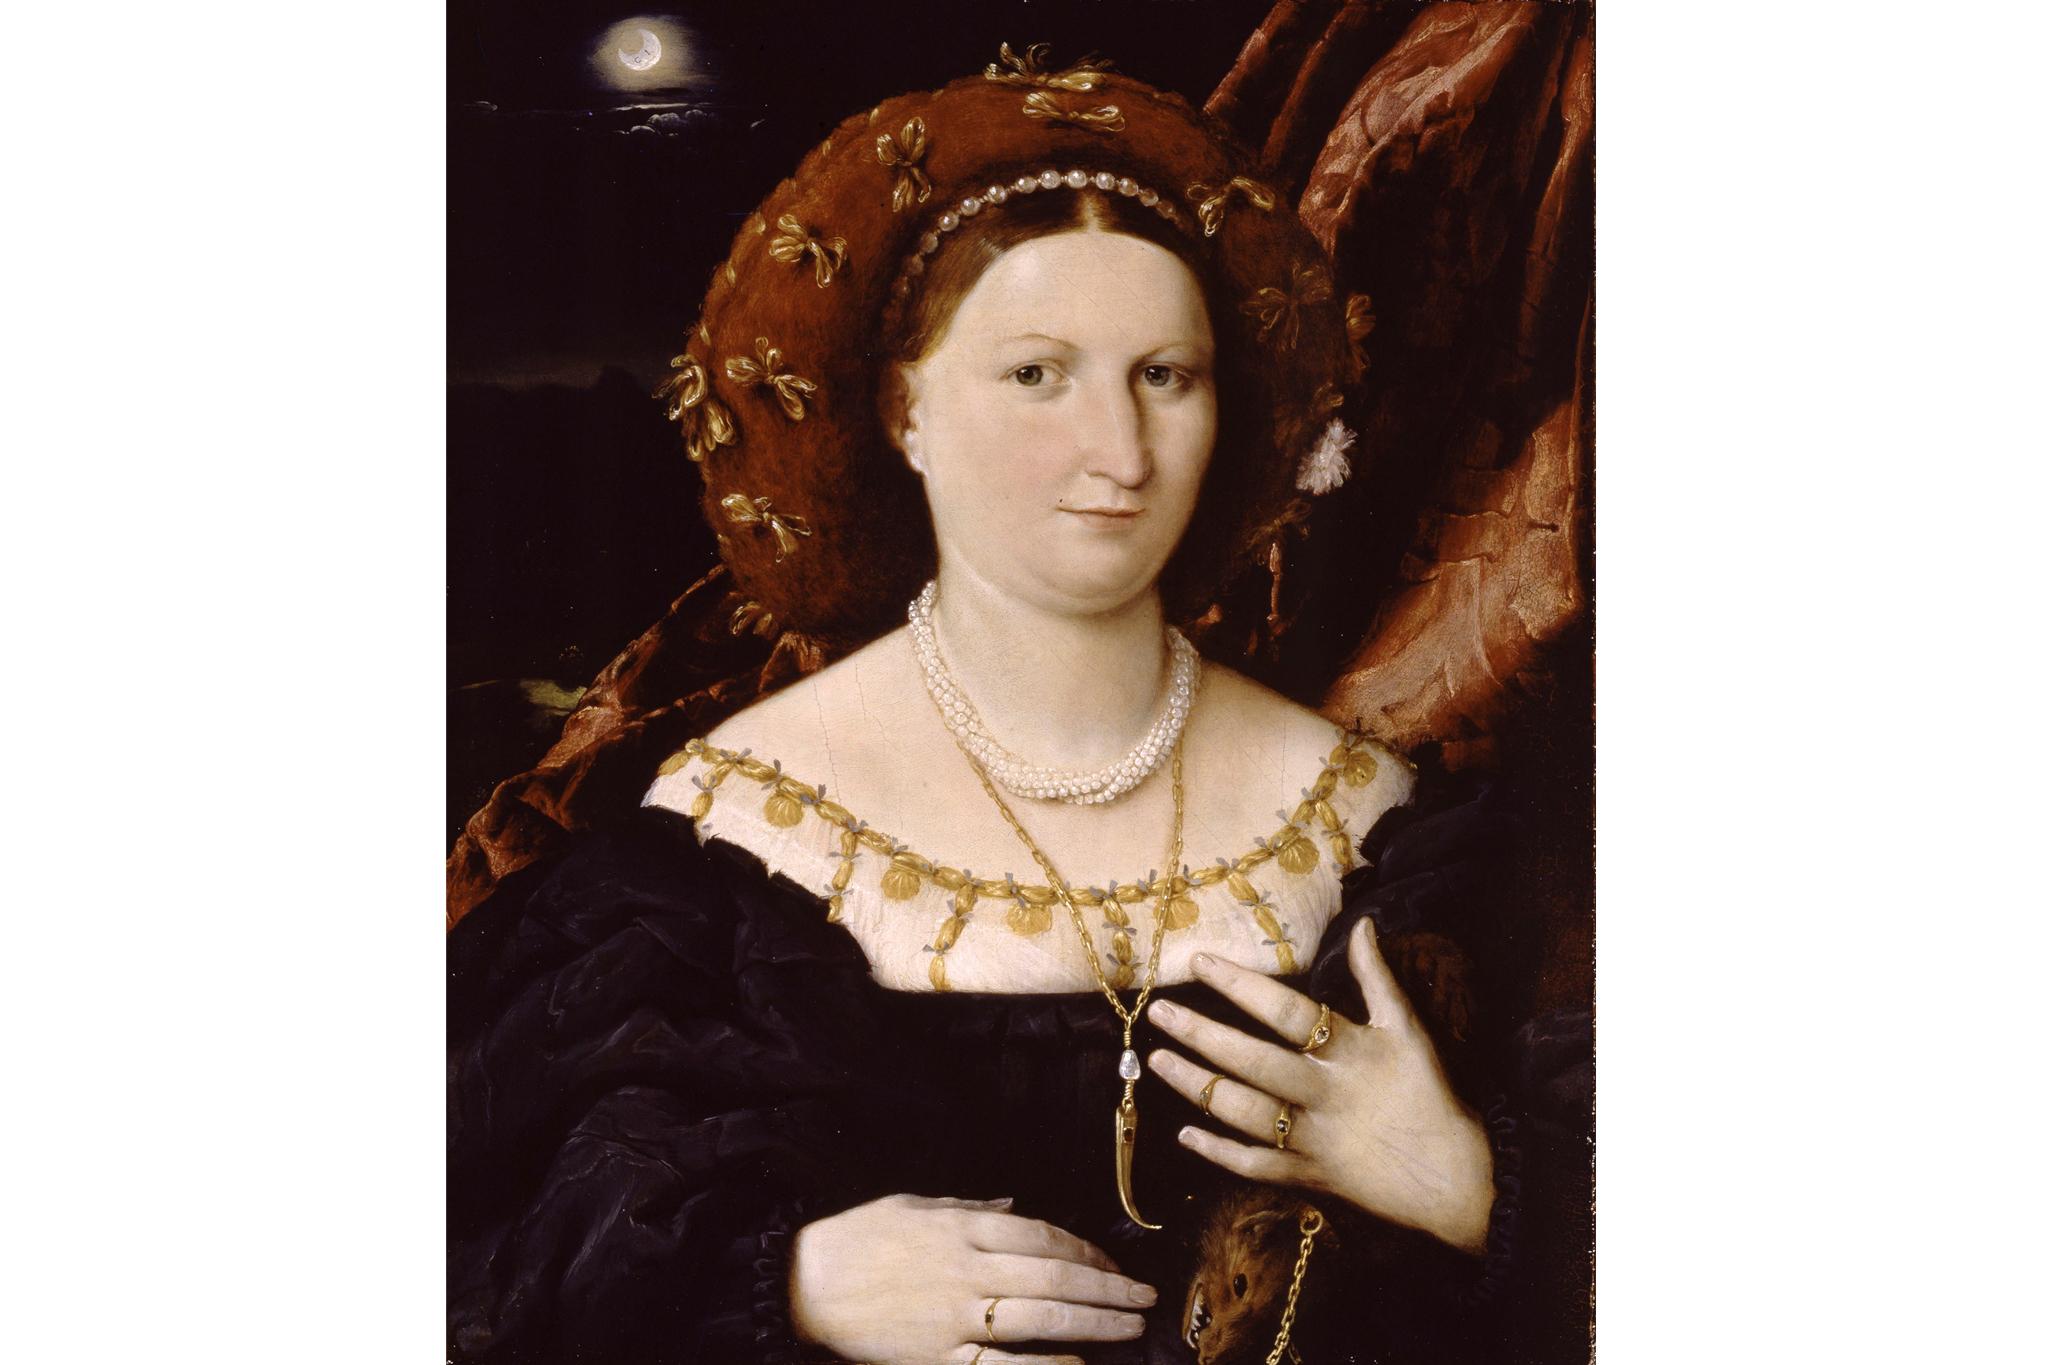 """Bellini, Titian and Lotto: North Italian Paintings from the Accademia Carrara, Bergamo"""